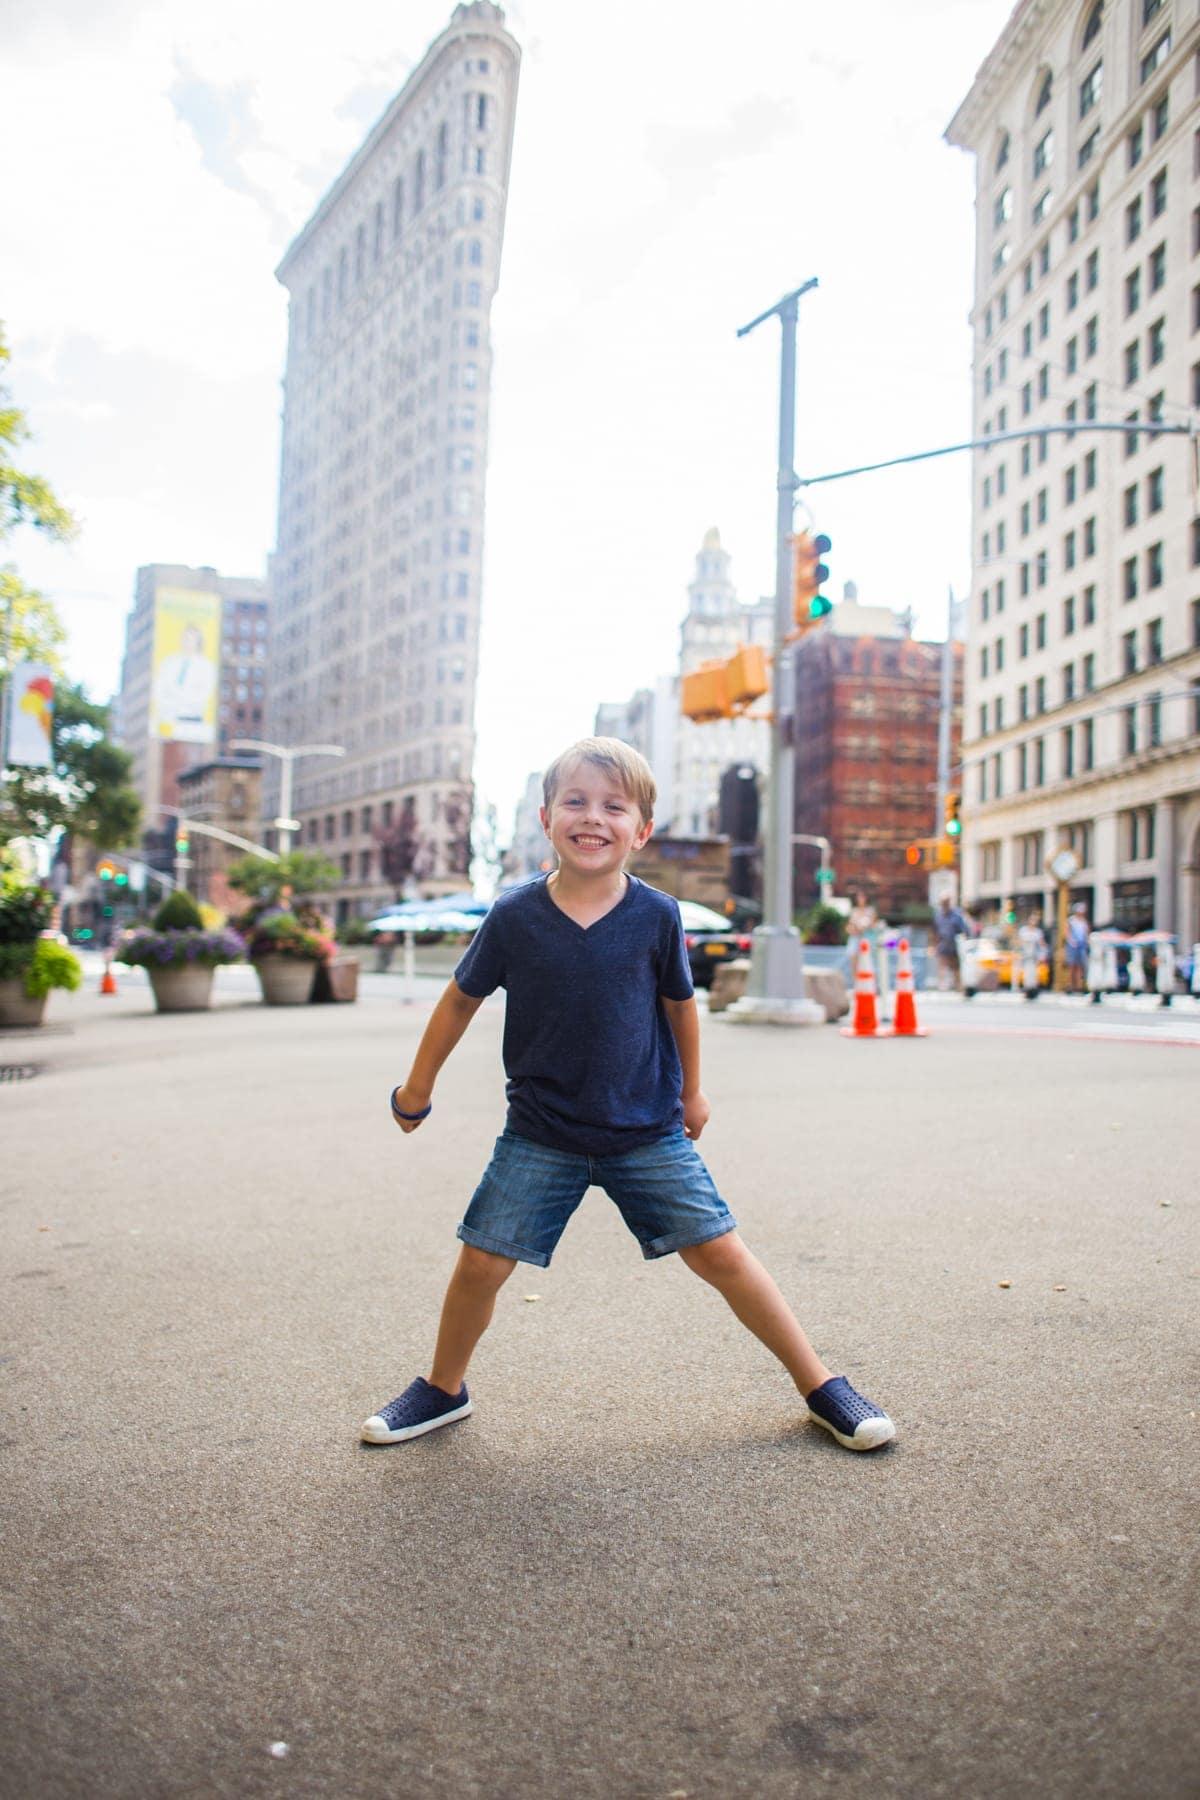 Blake in the street